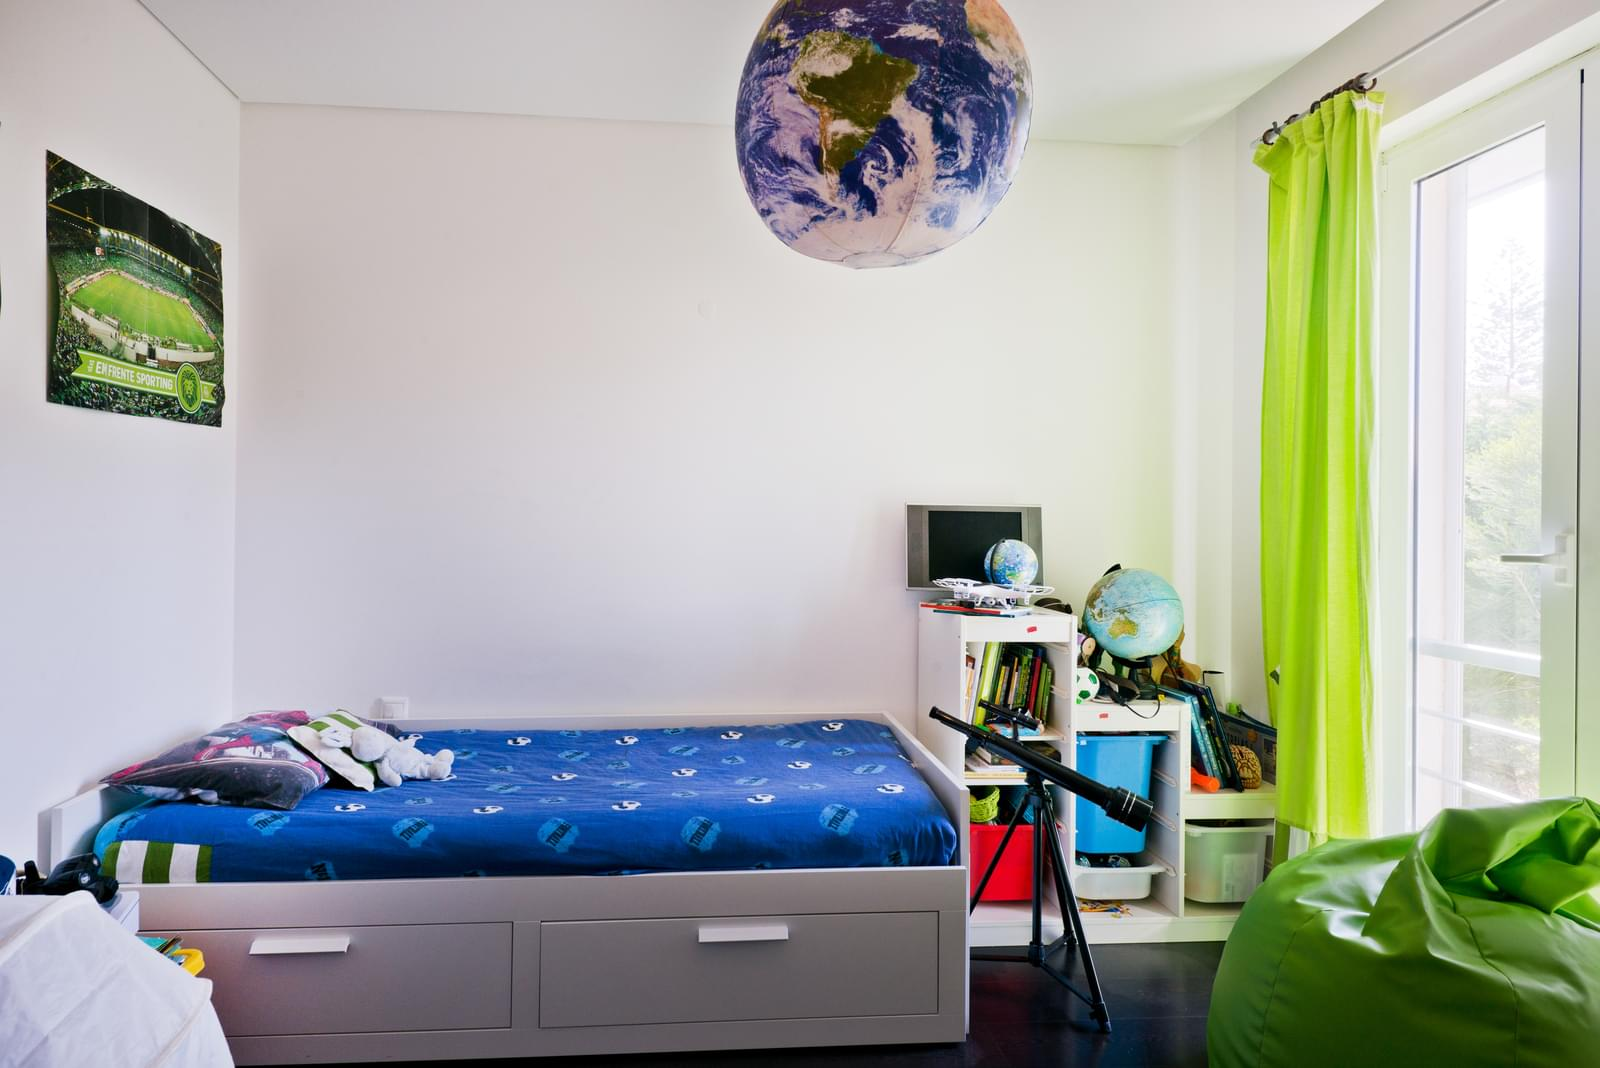 pf17099-apartamento-t3-sintra-04579e84-63ec-42e8-b9be-f7a141166450